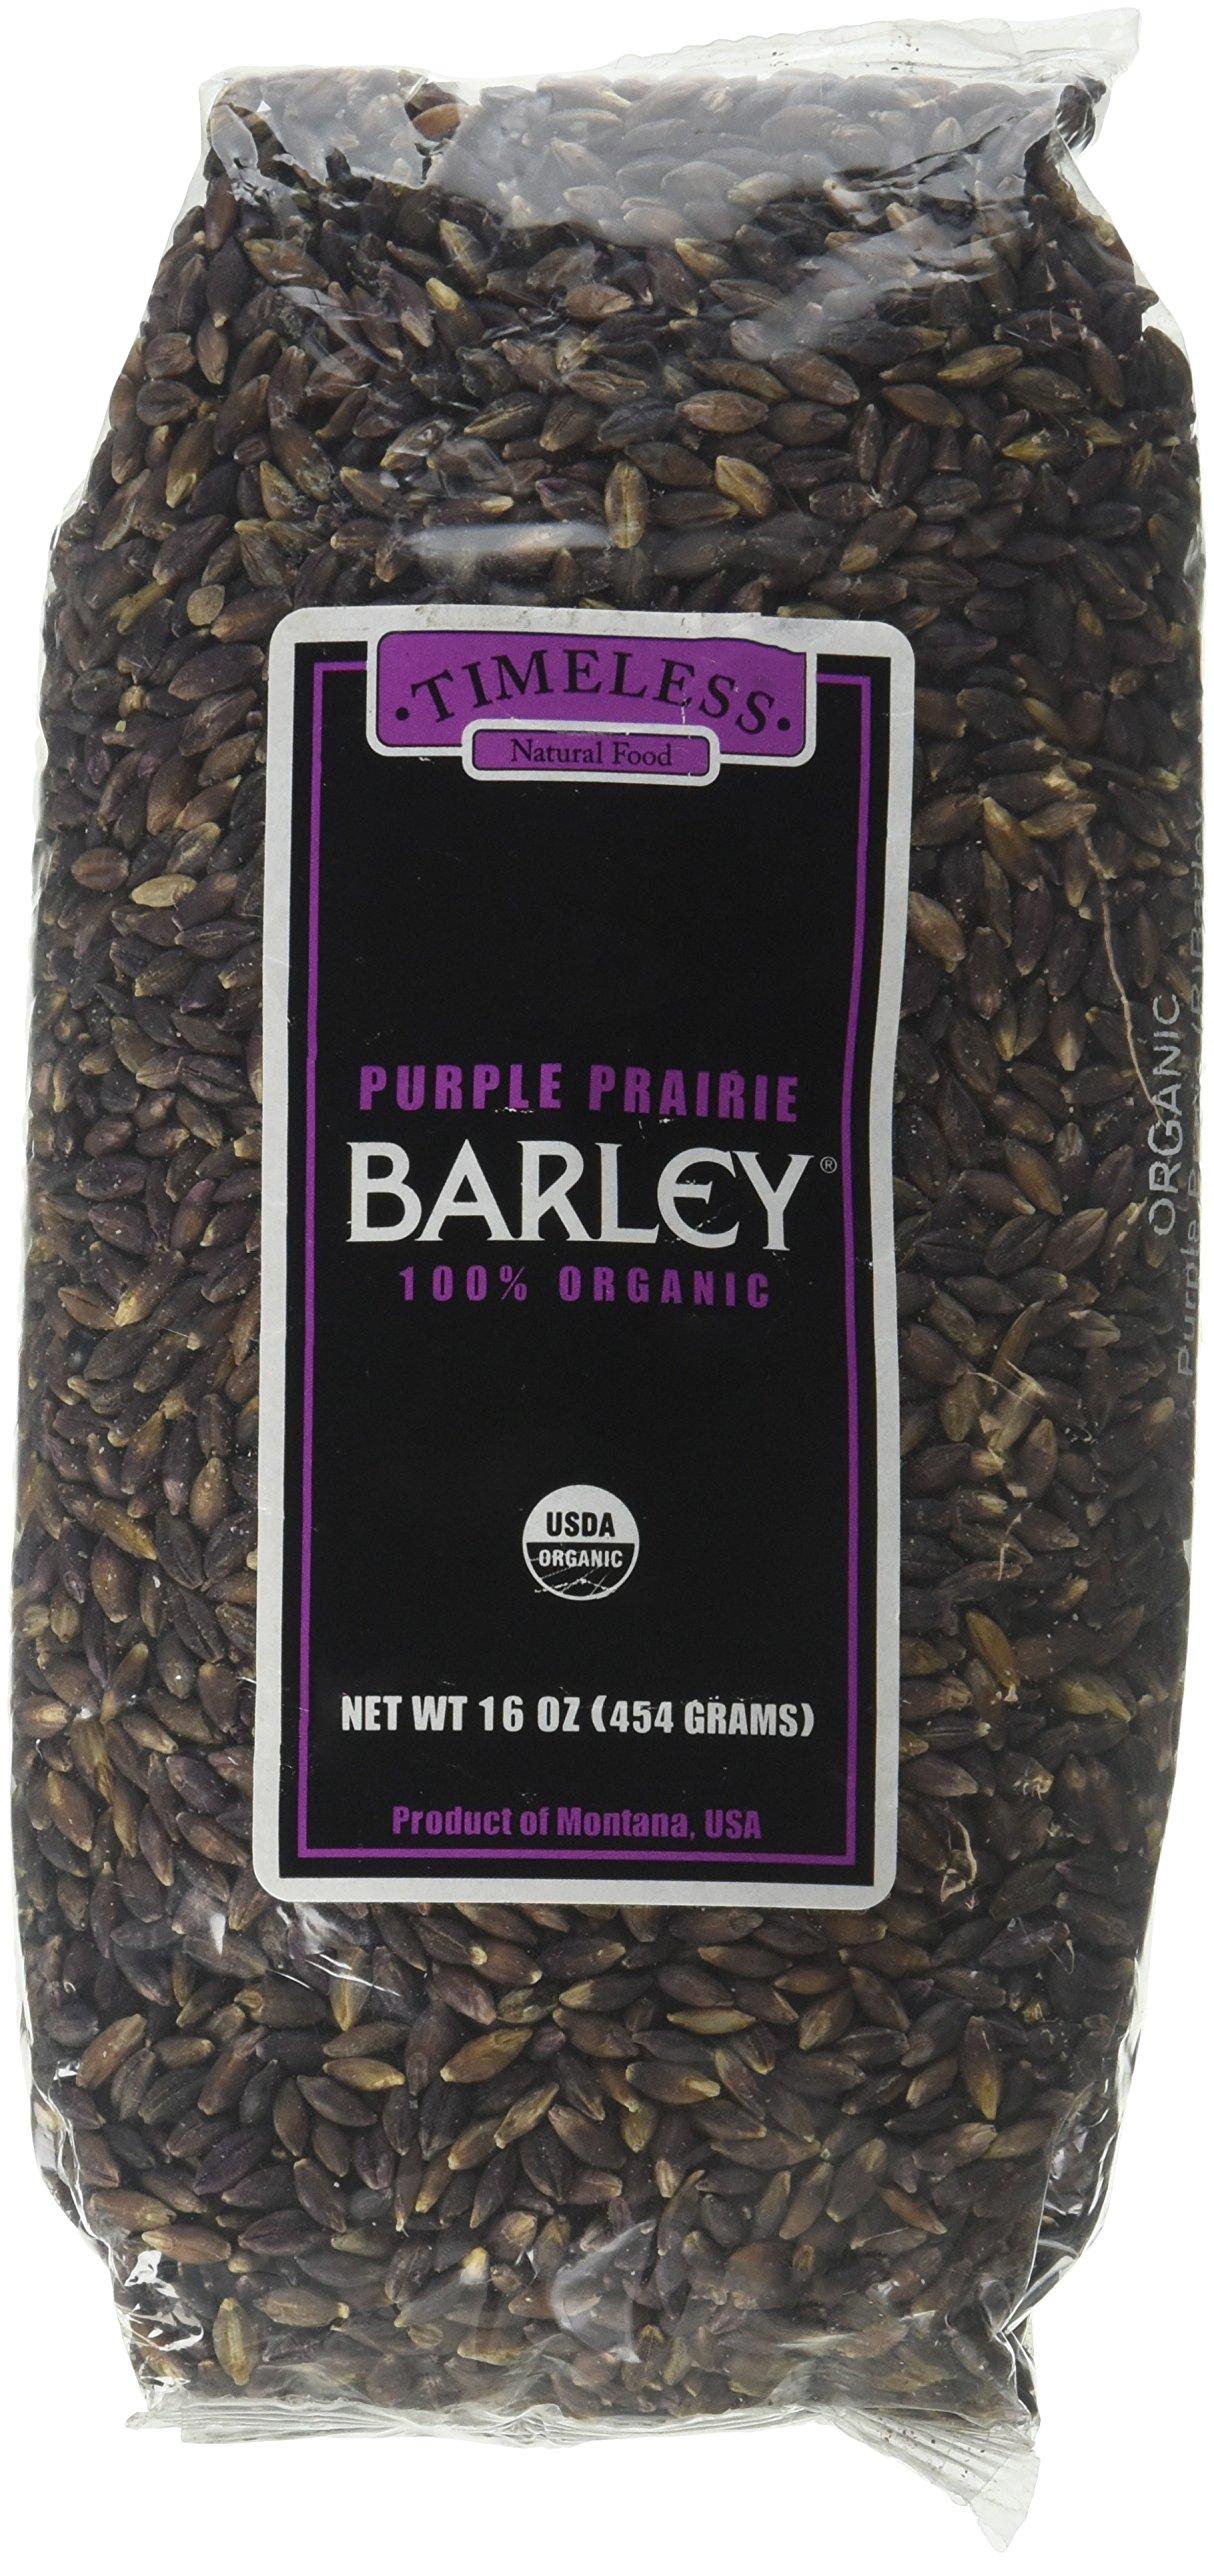 Certified 100% Organic Purple Prairie Barley Montana 454 g 16 oz by Timeless Natural Food (Image #1)